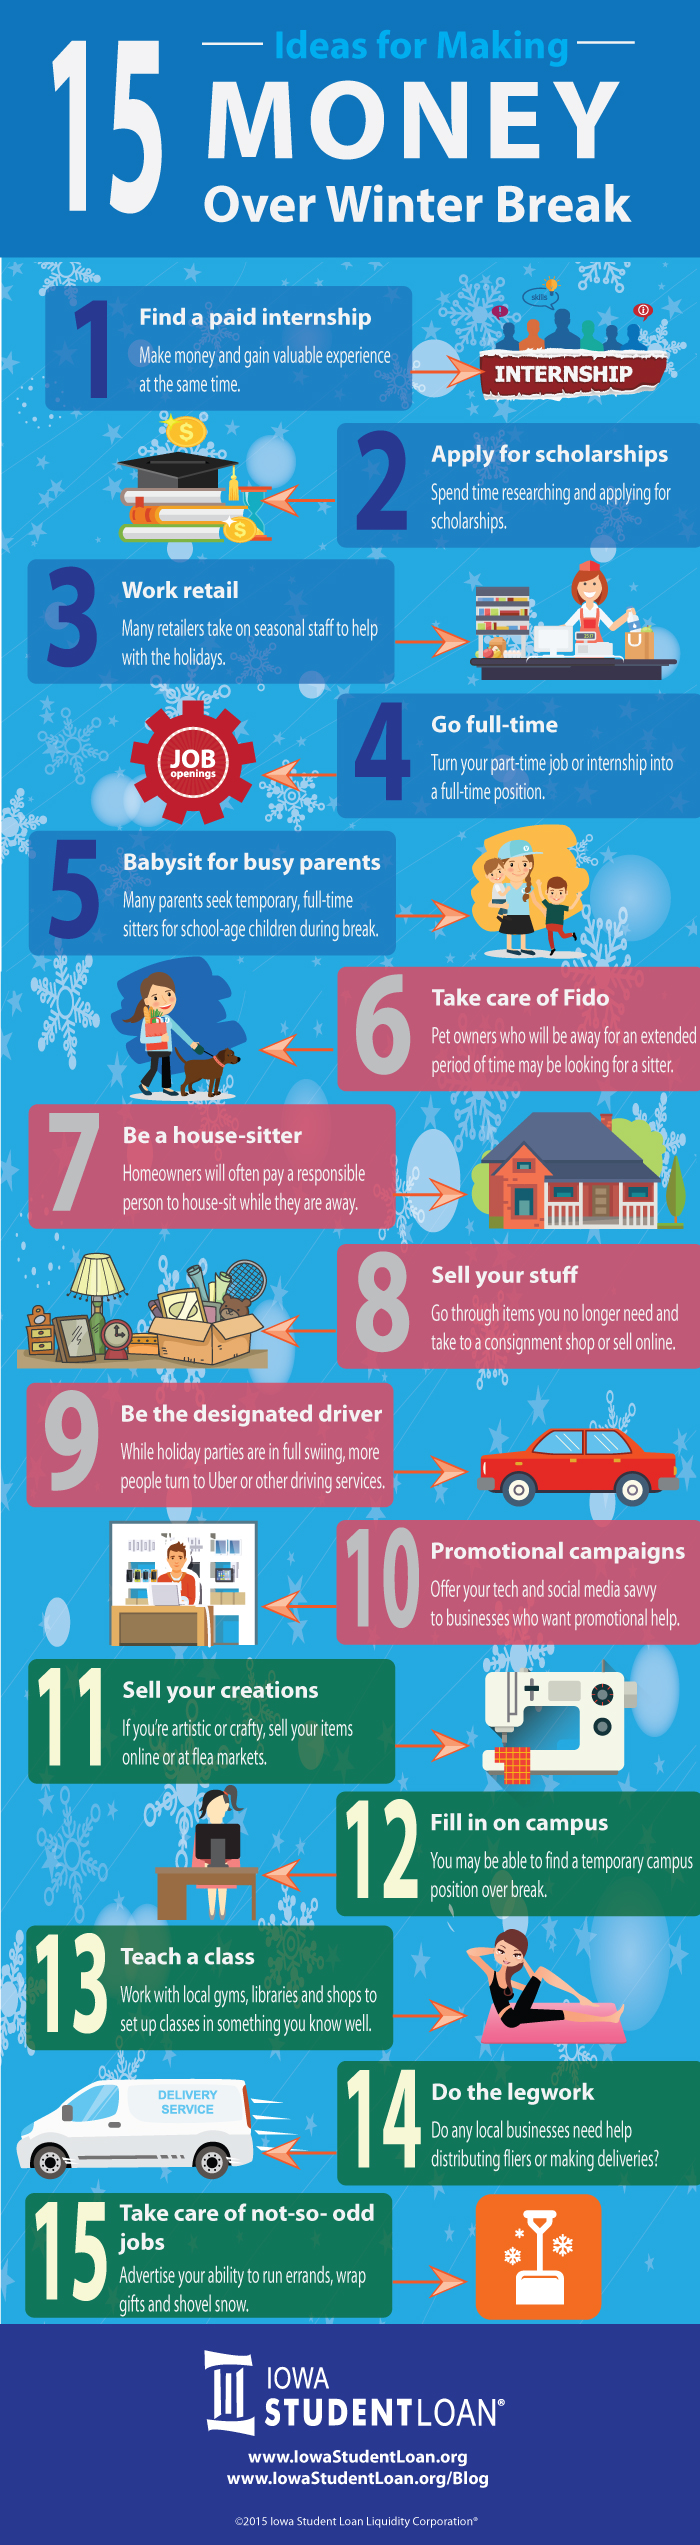 5 Ideas for Making Money During Winter Break #infographic #Make Money #How to Make Money #Ideas #Winter Break #Holiday Season #Money